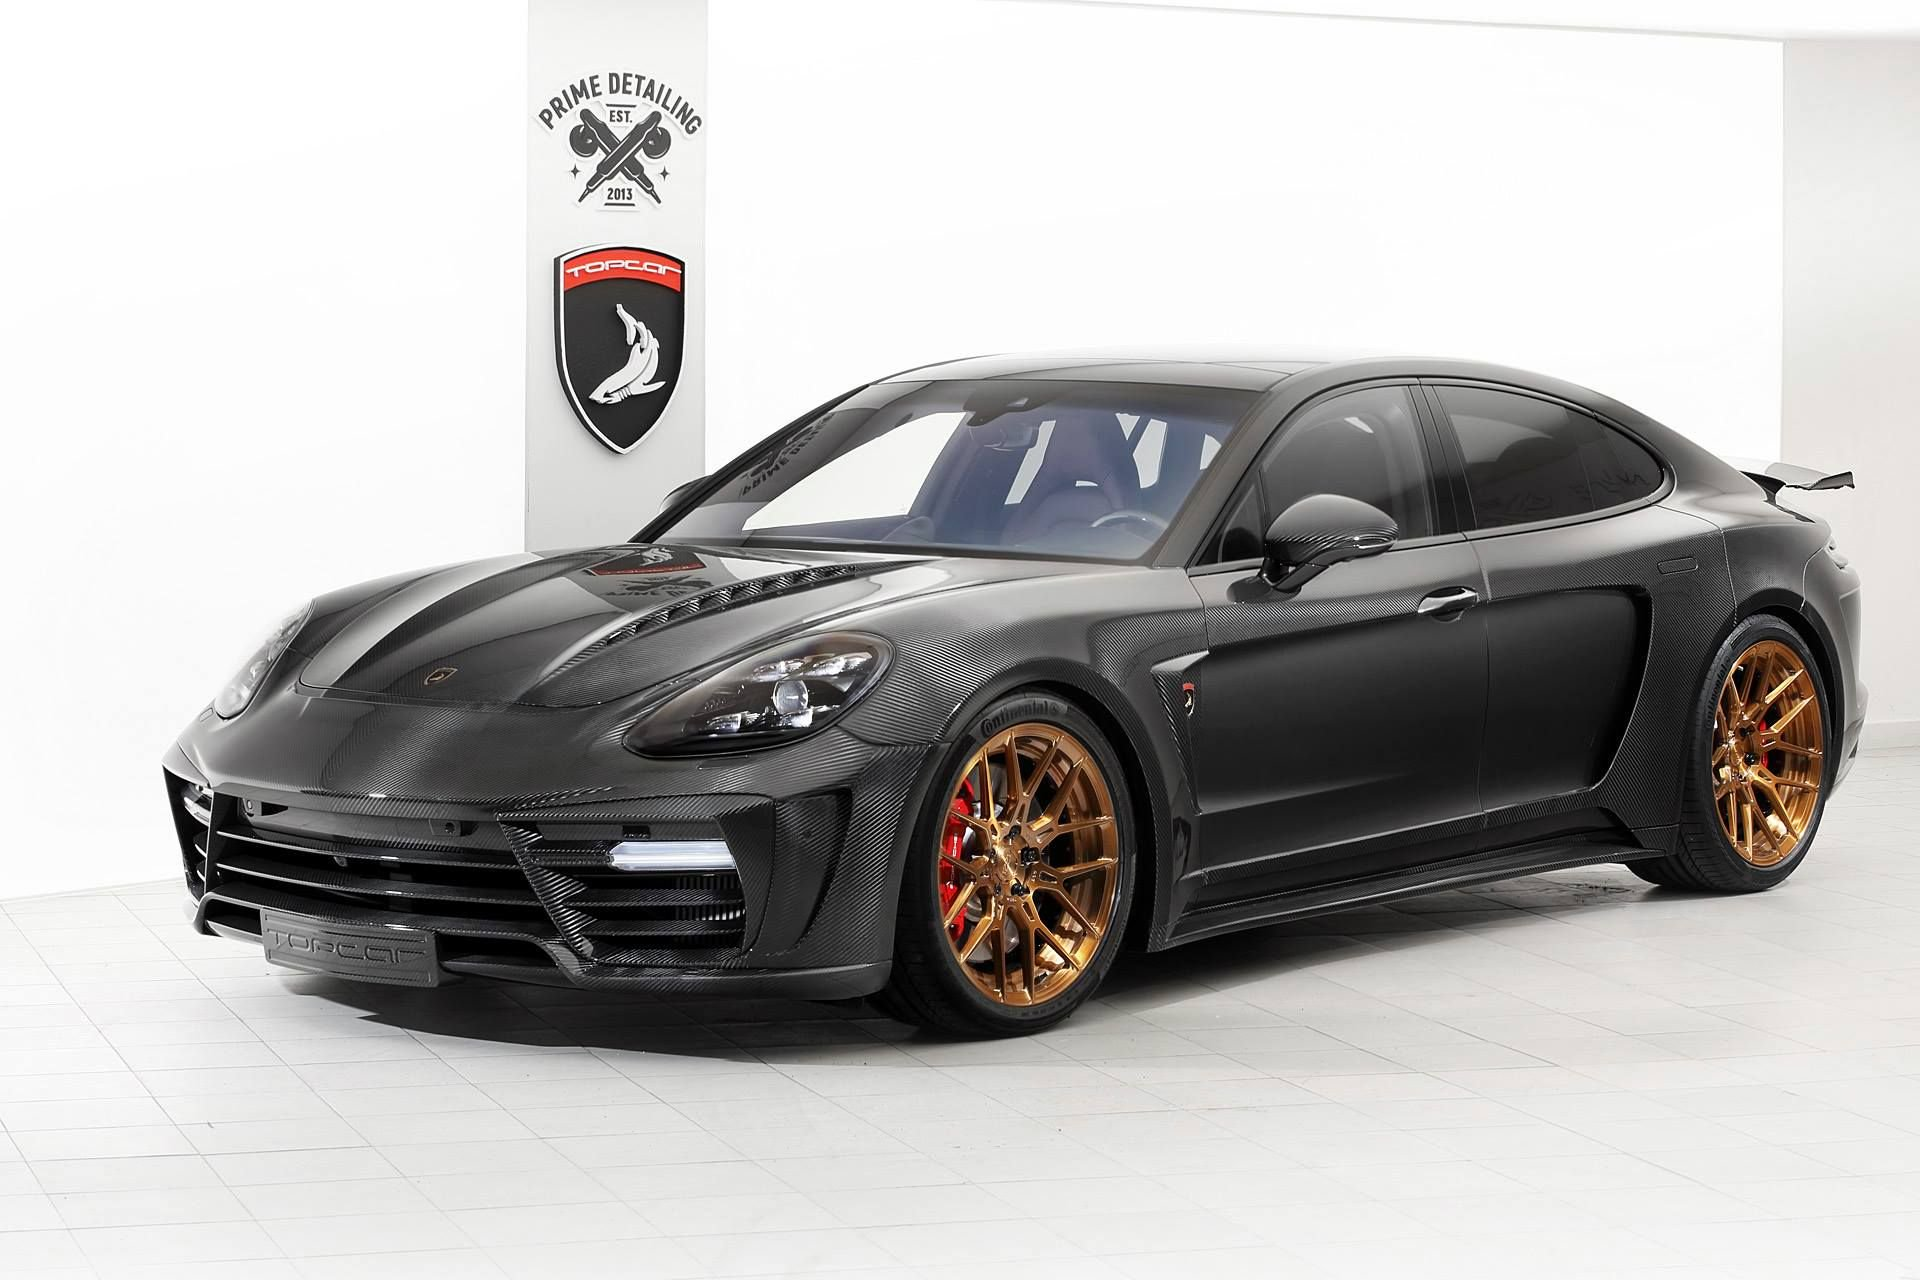 Porsche_Panamera_GTR_Carbon_Edition_by_TopCar_0002